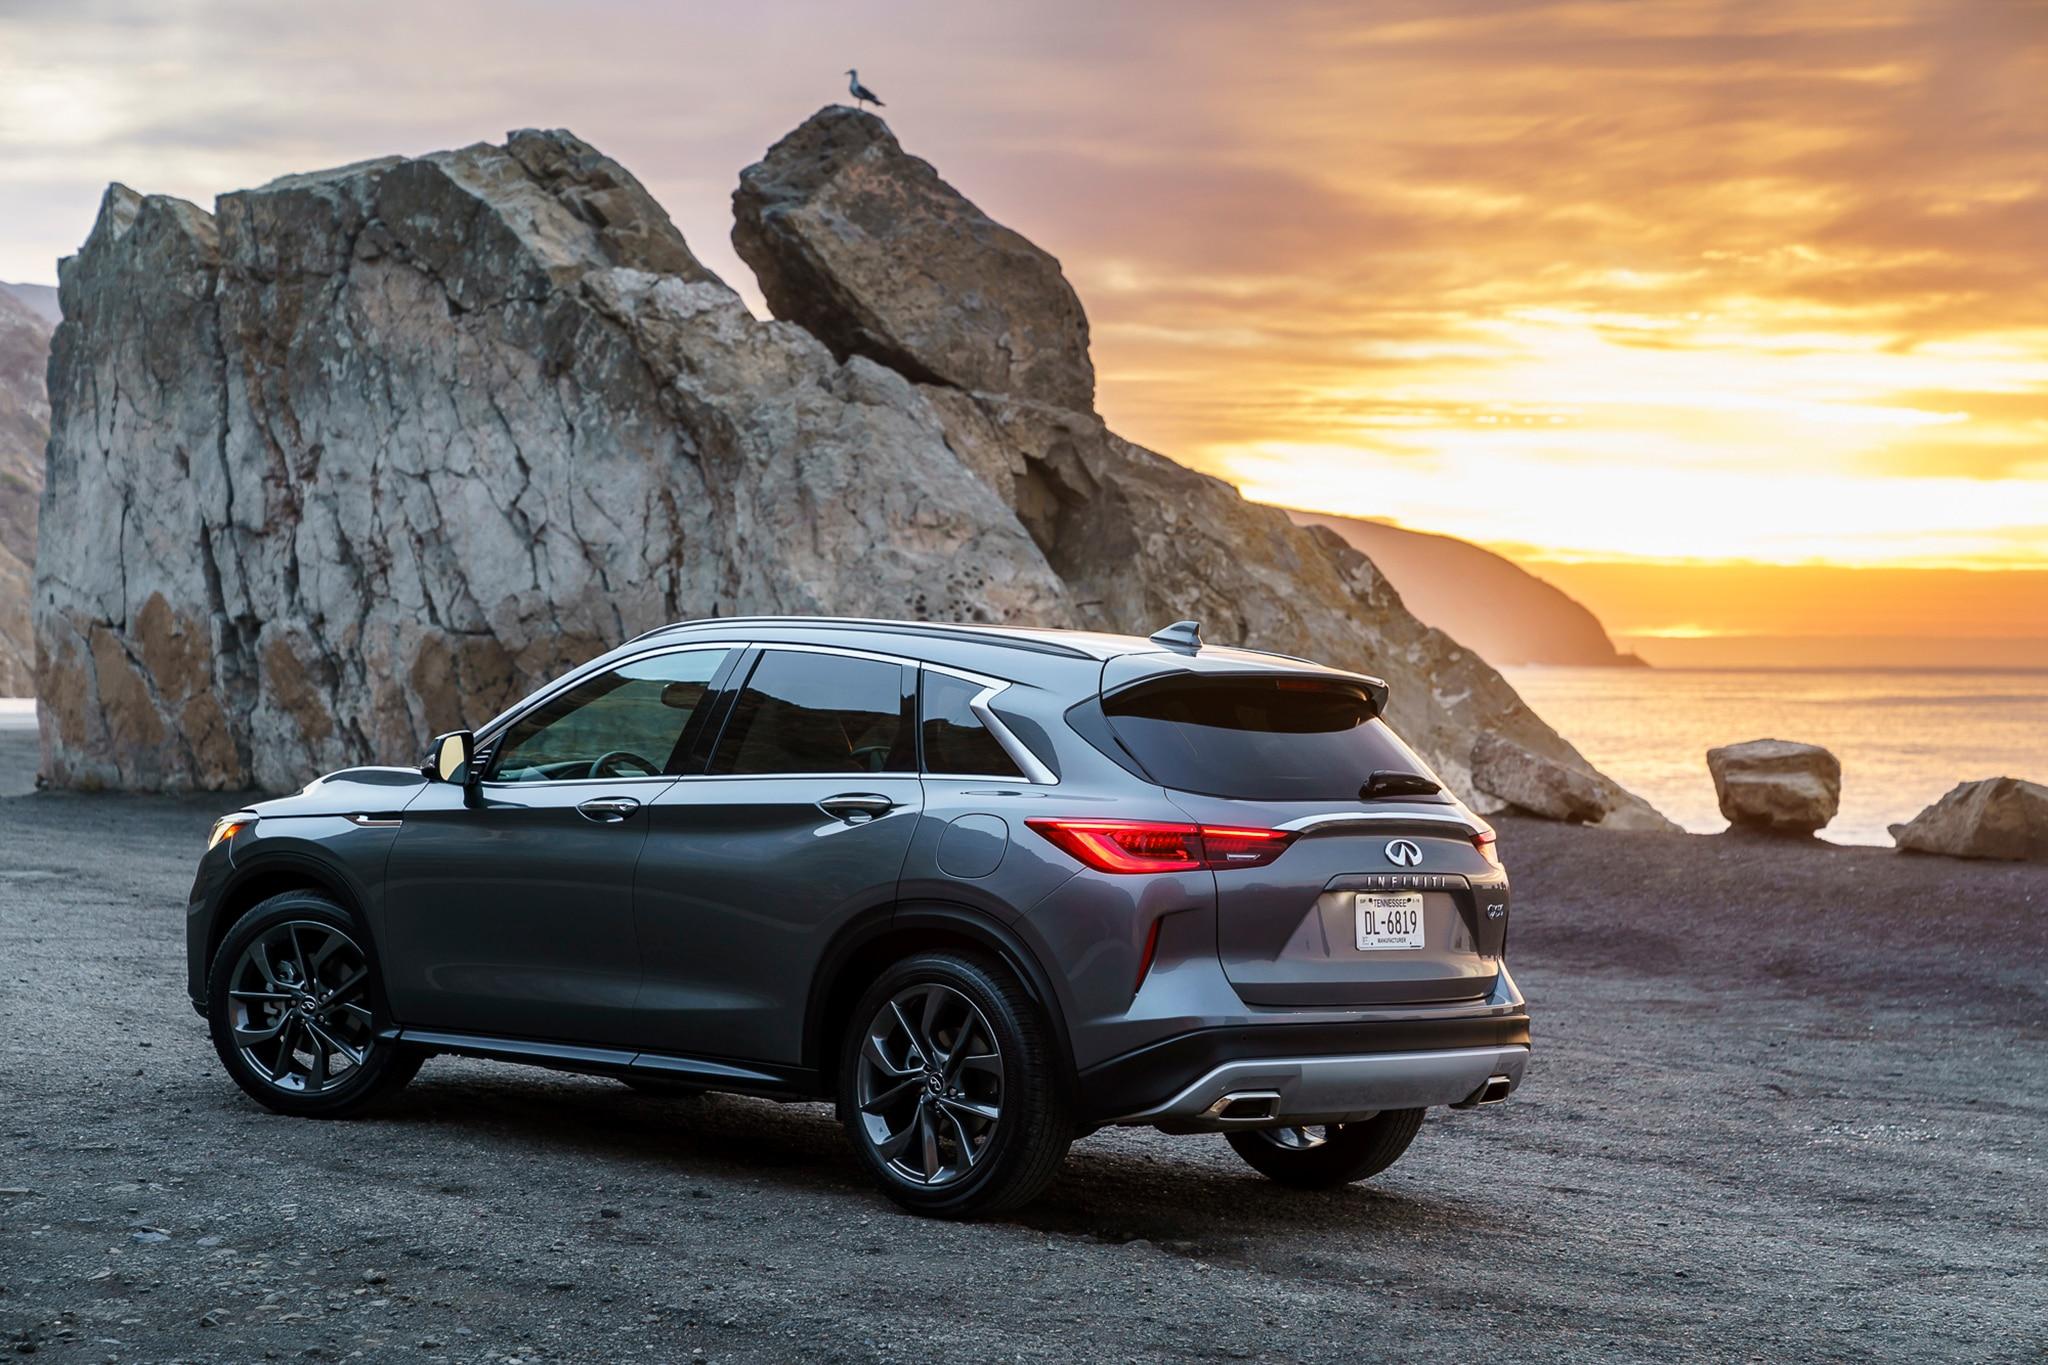 2019 Infiniti QX50 Revealed Ahead Of 2017 Los Angeles Auto